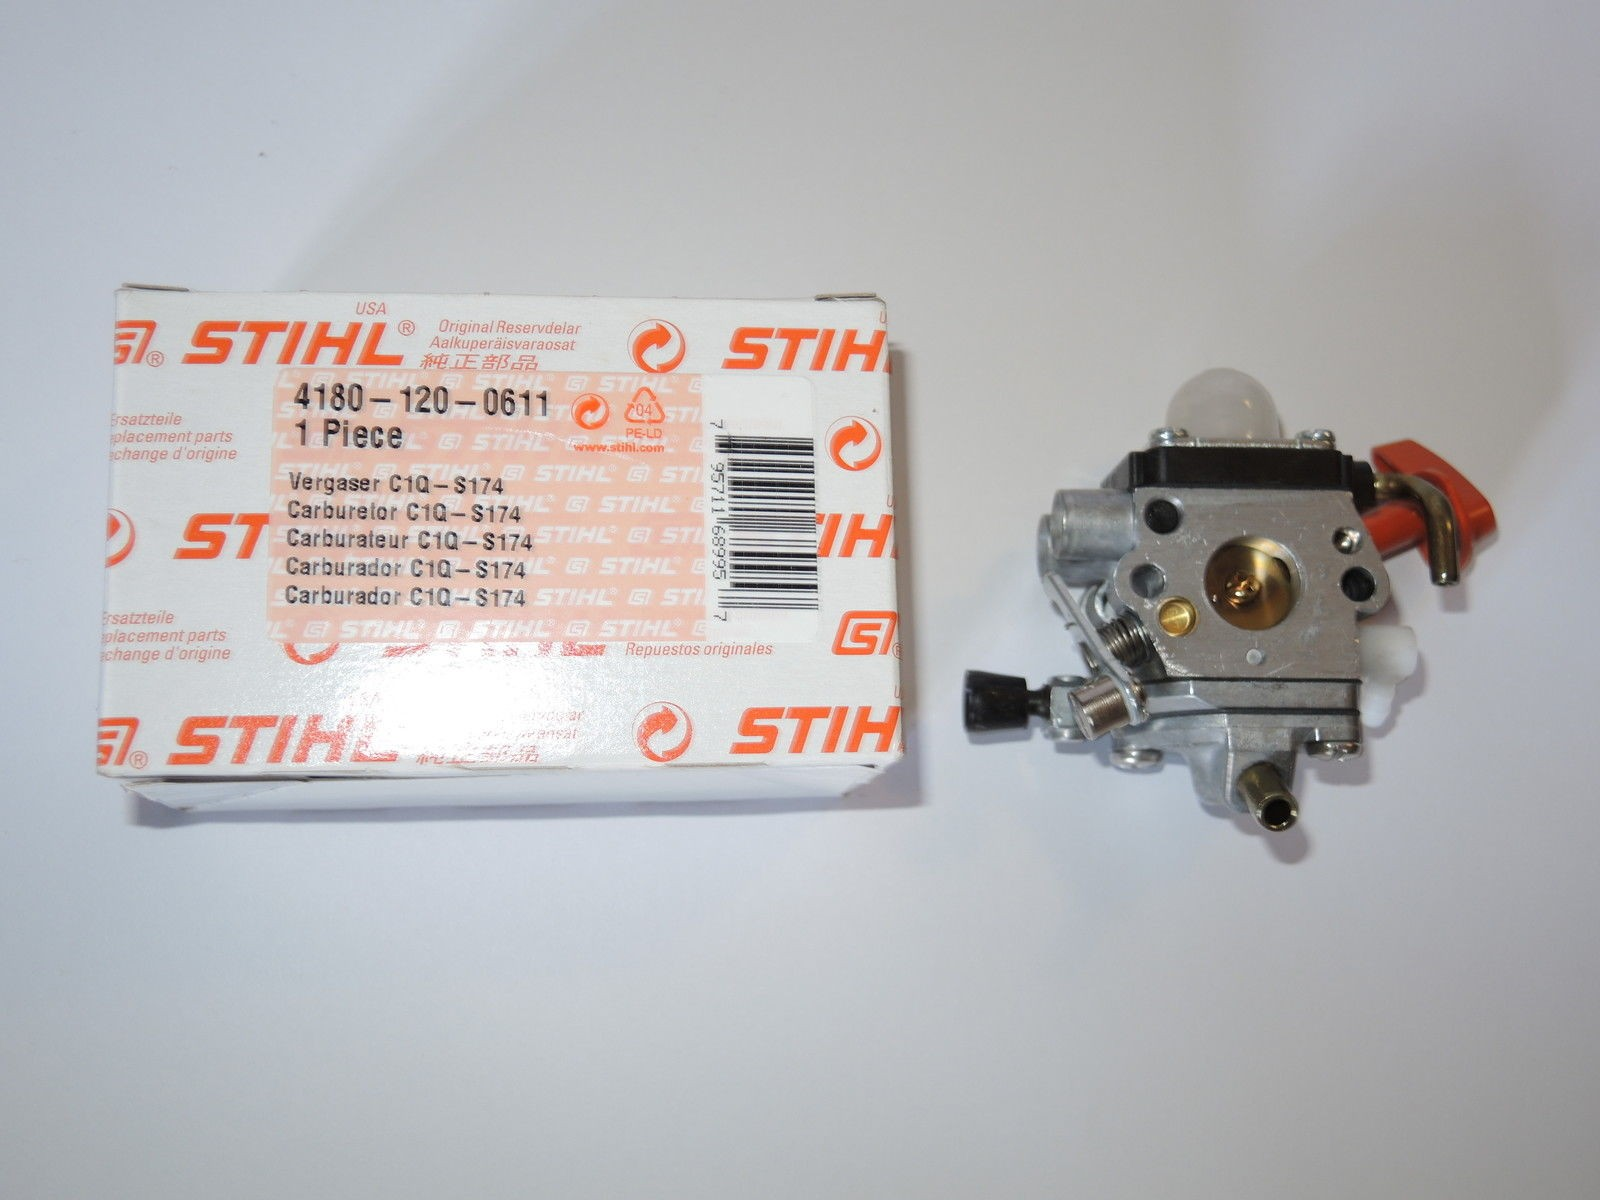 Stihl Carburettor C1Q-S174 for FS FC FT HL HT KM 87 90 95 100 101 110 -  AMEISENGARTEN